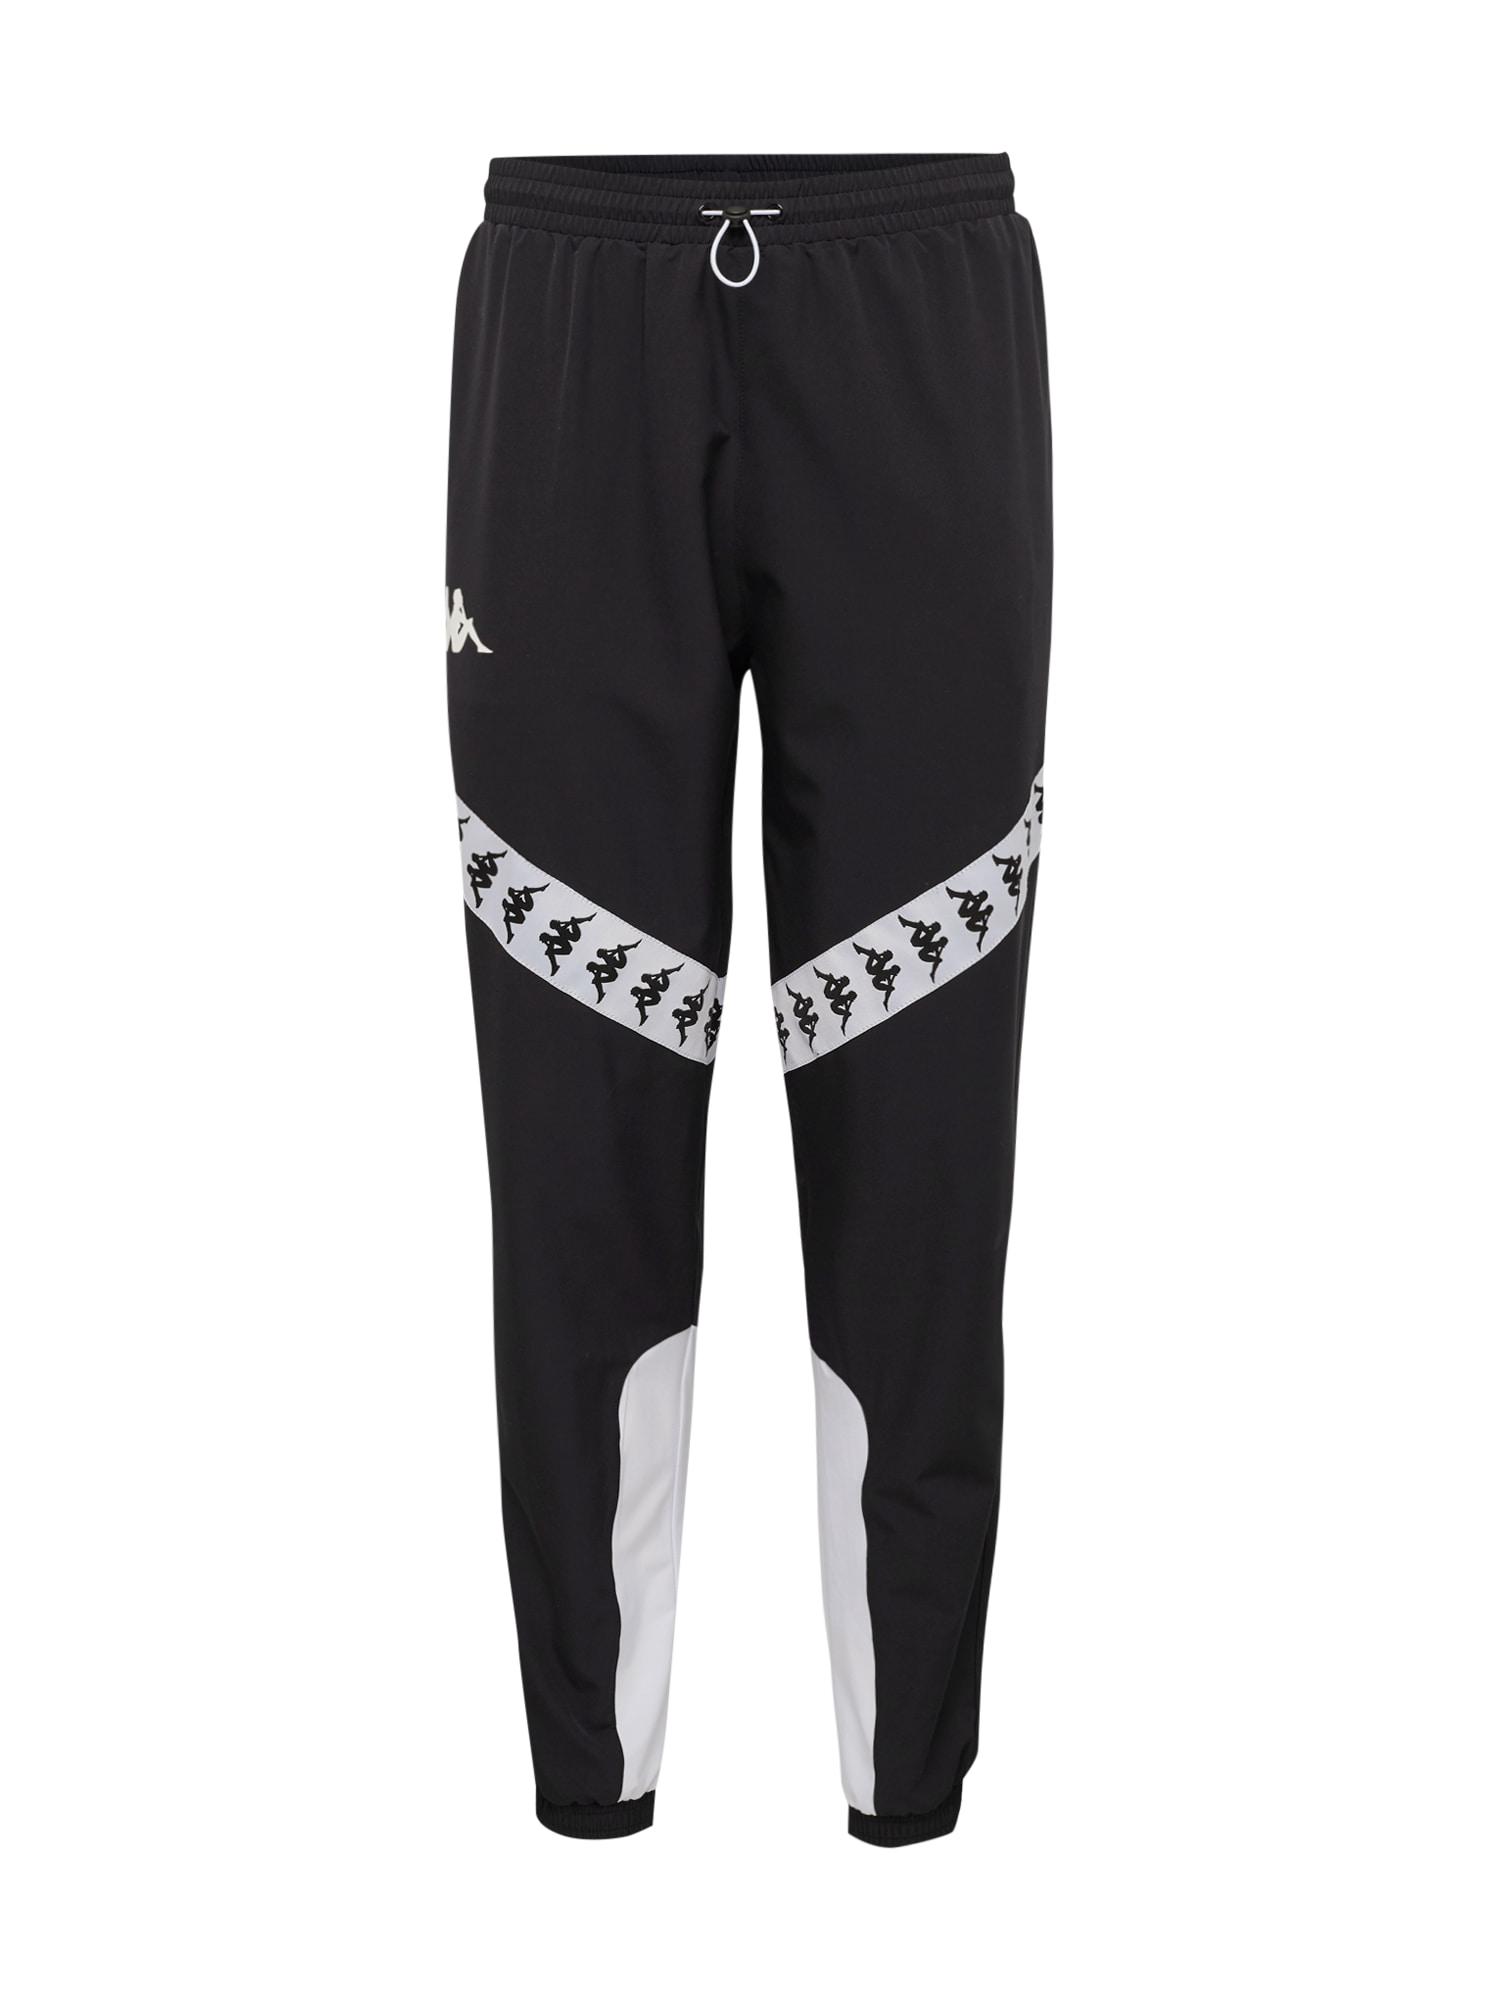 Kalhoty 222 BANDA BALMAR černá bílá KAPPA